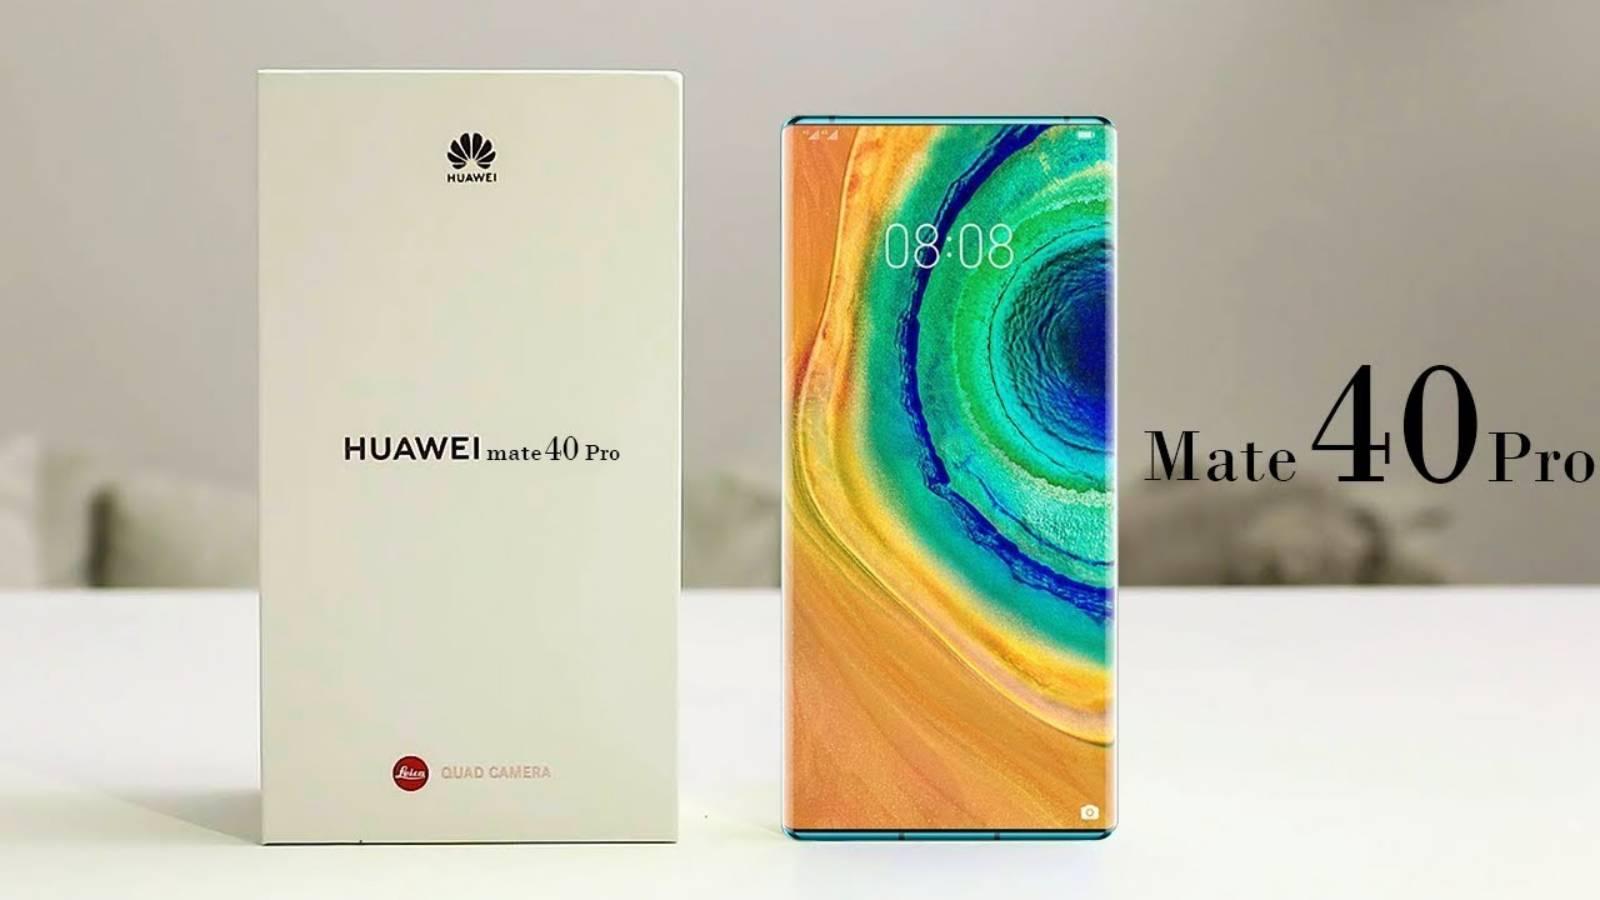 Huawei MATE 40 PRO uimire